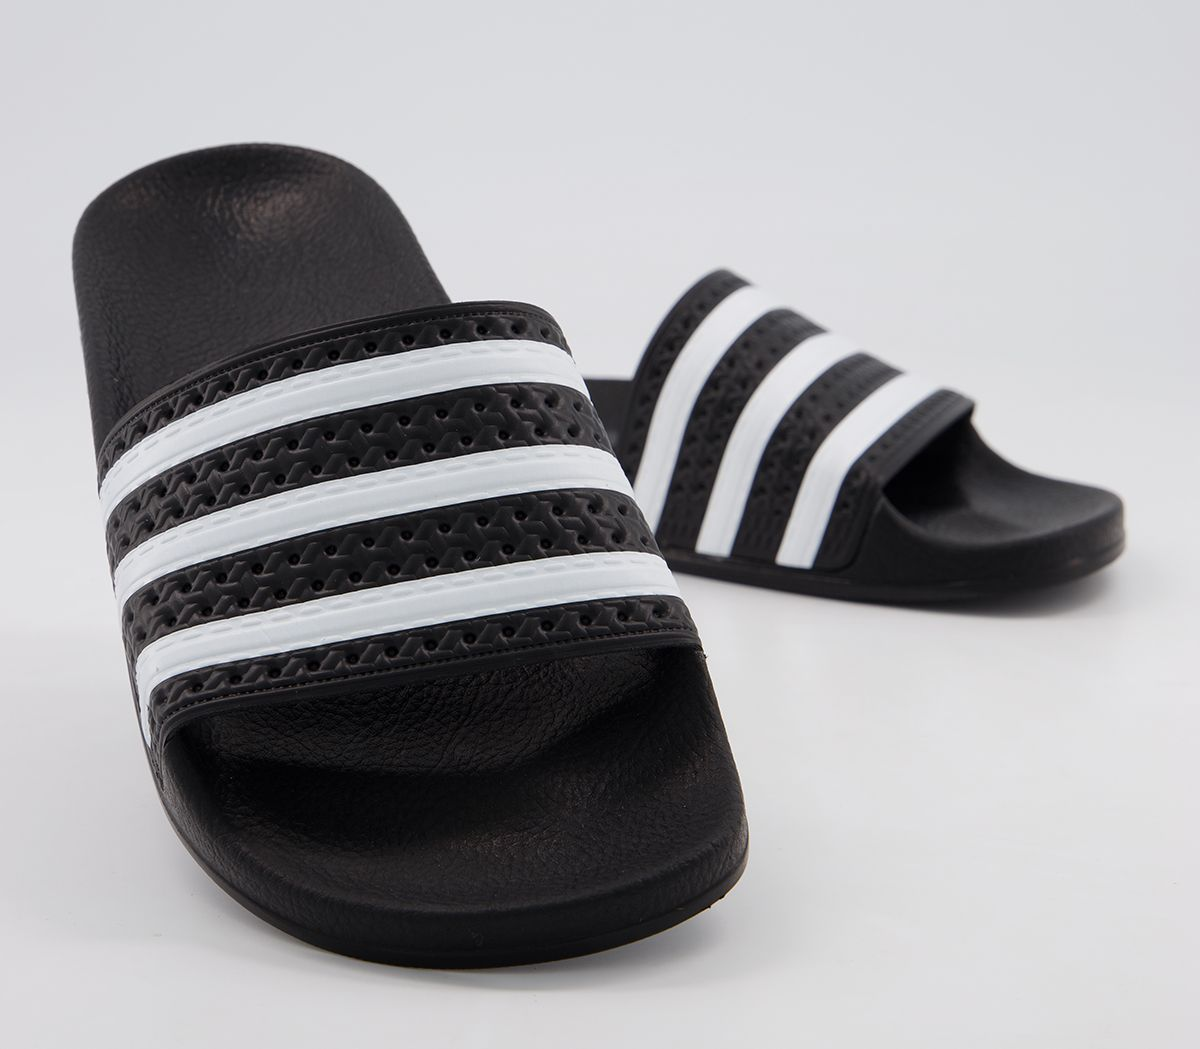 aac9c13ac adidas Adilette Sliders Black White - Office Girl